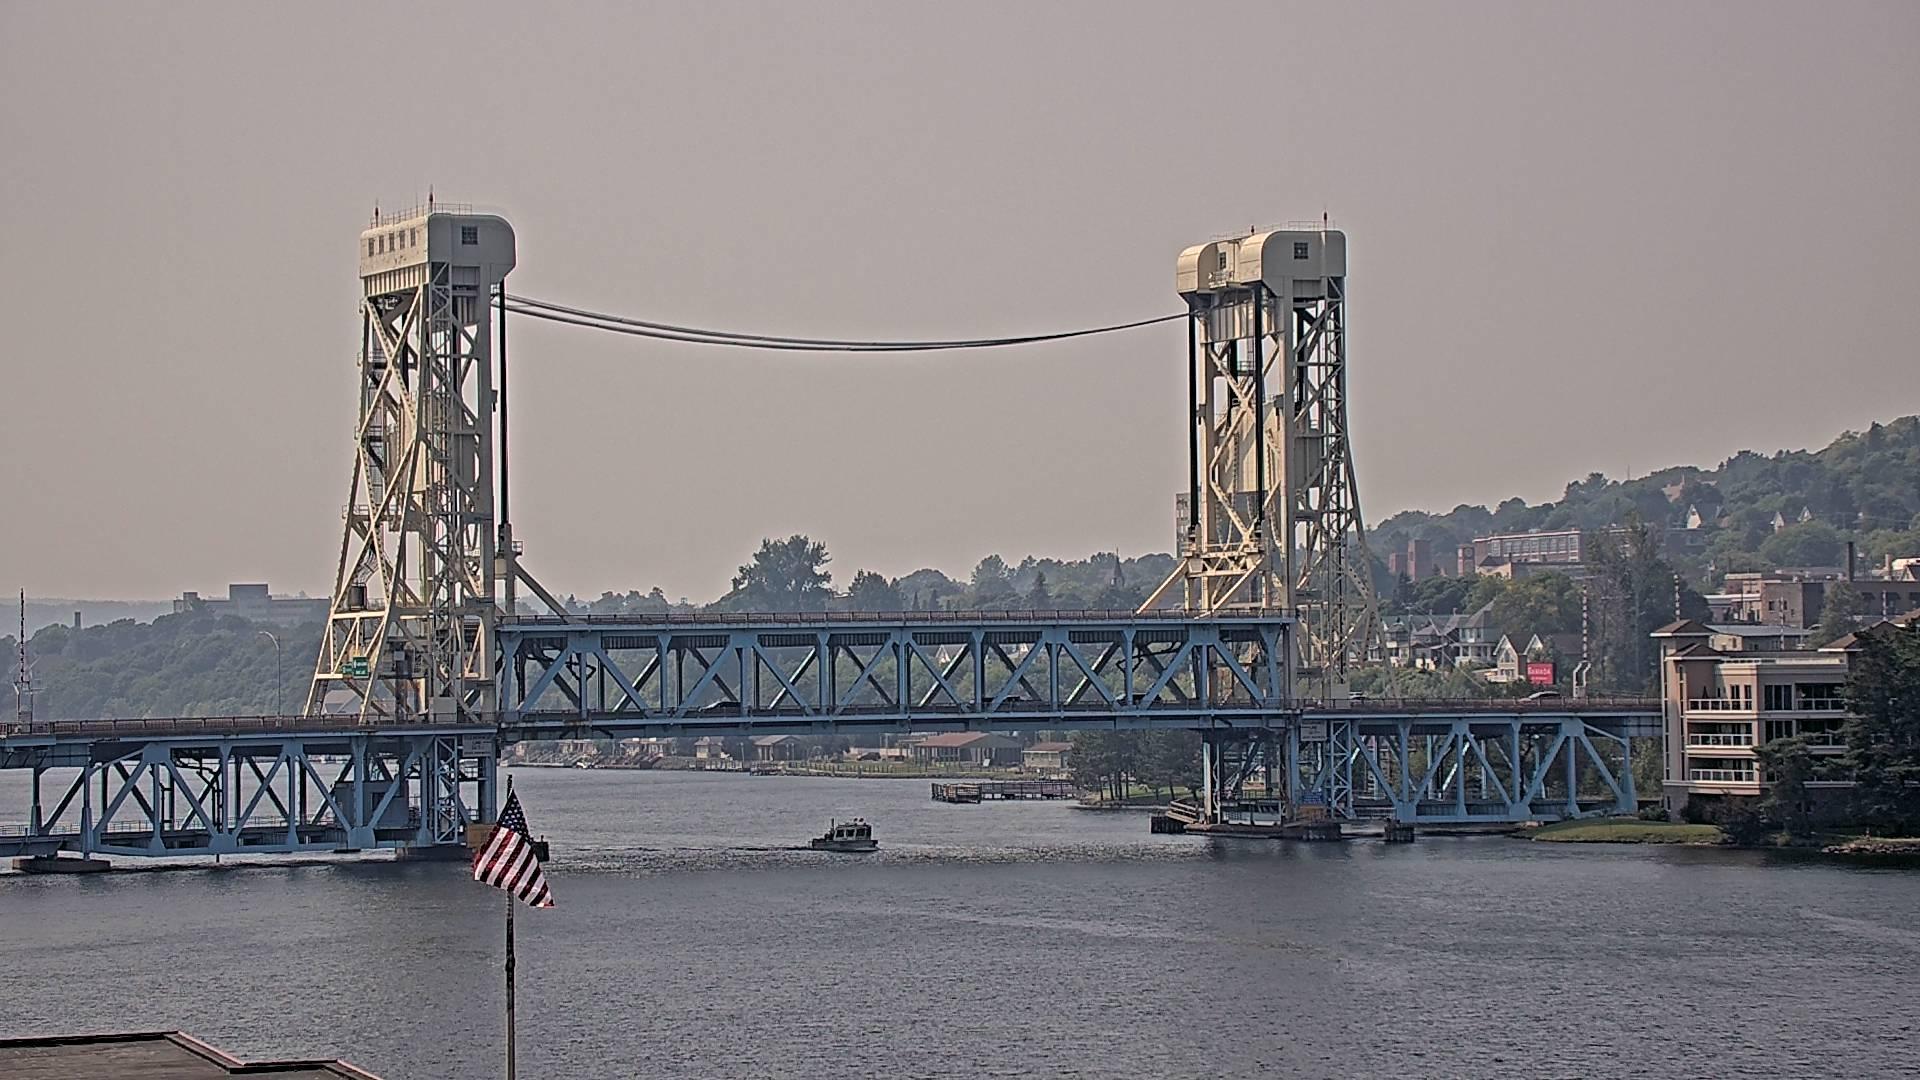 Webcam Hancock: Houghton − Bridge − Tech Fund Cam